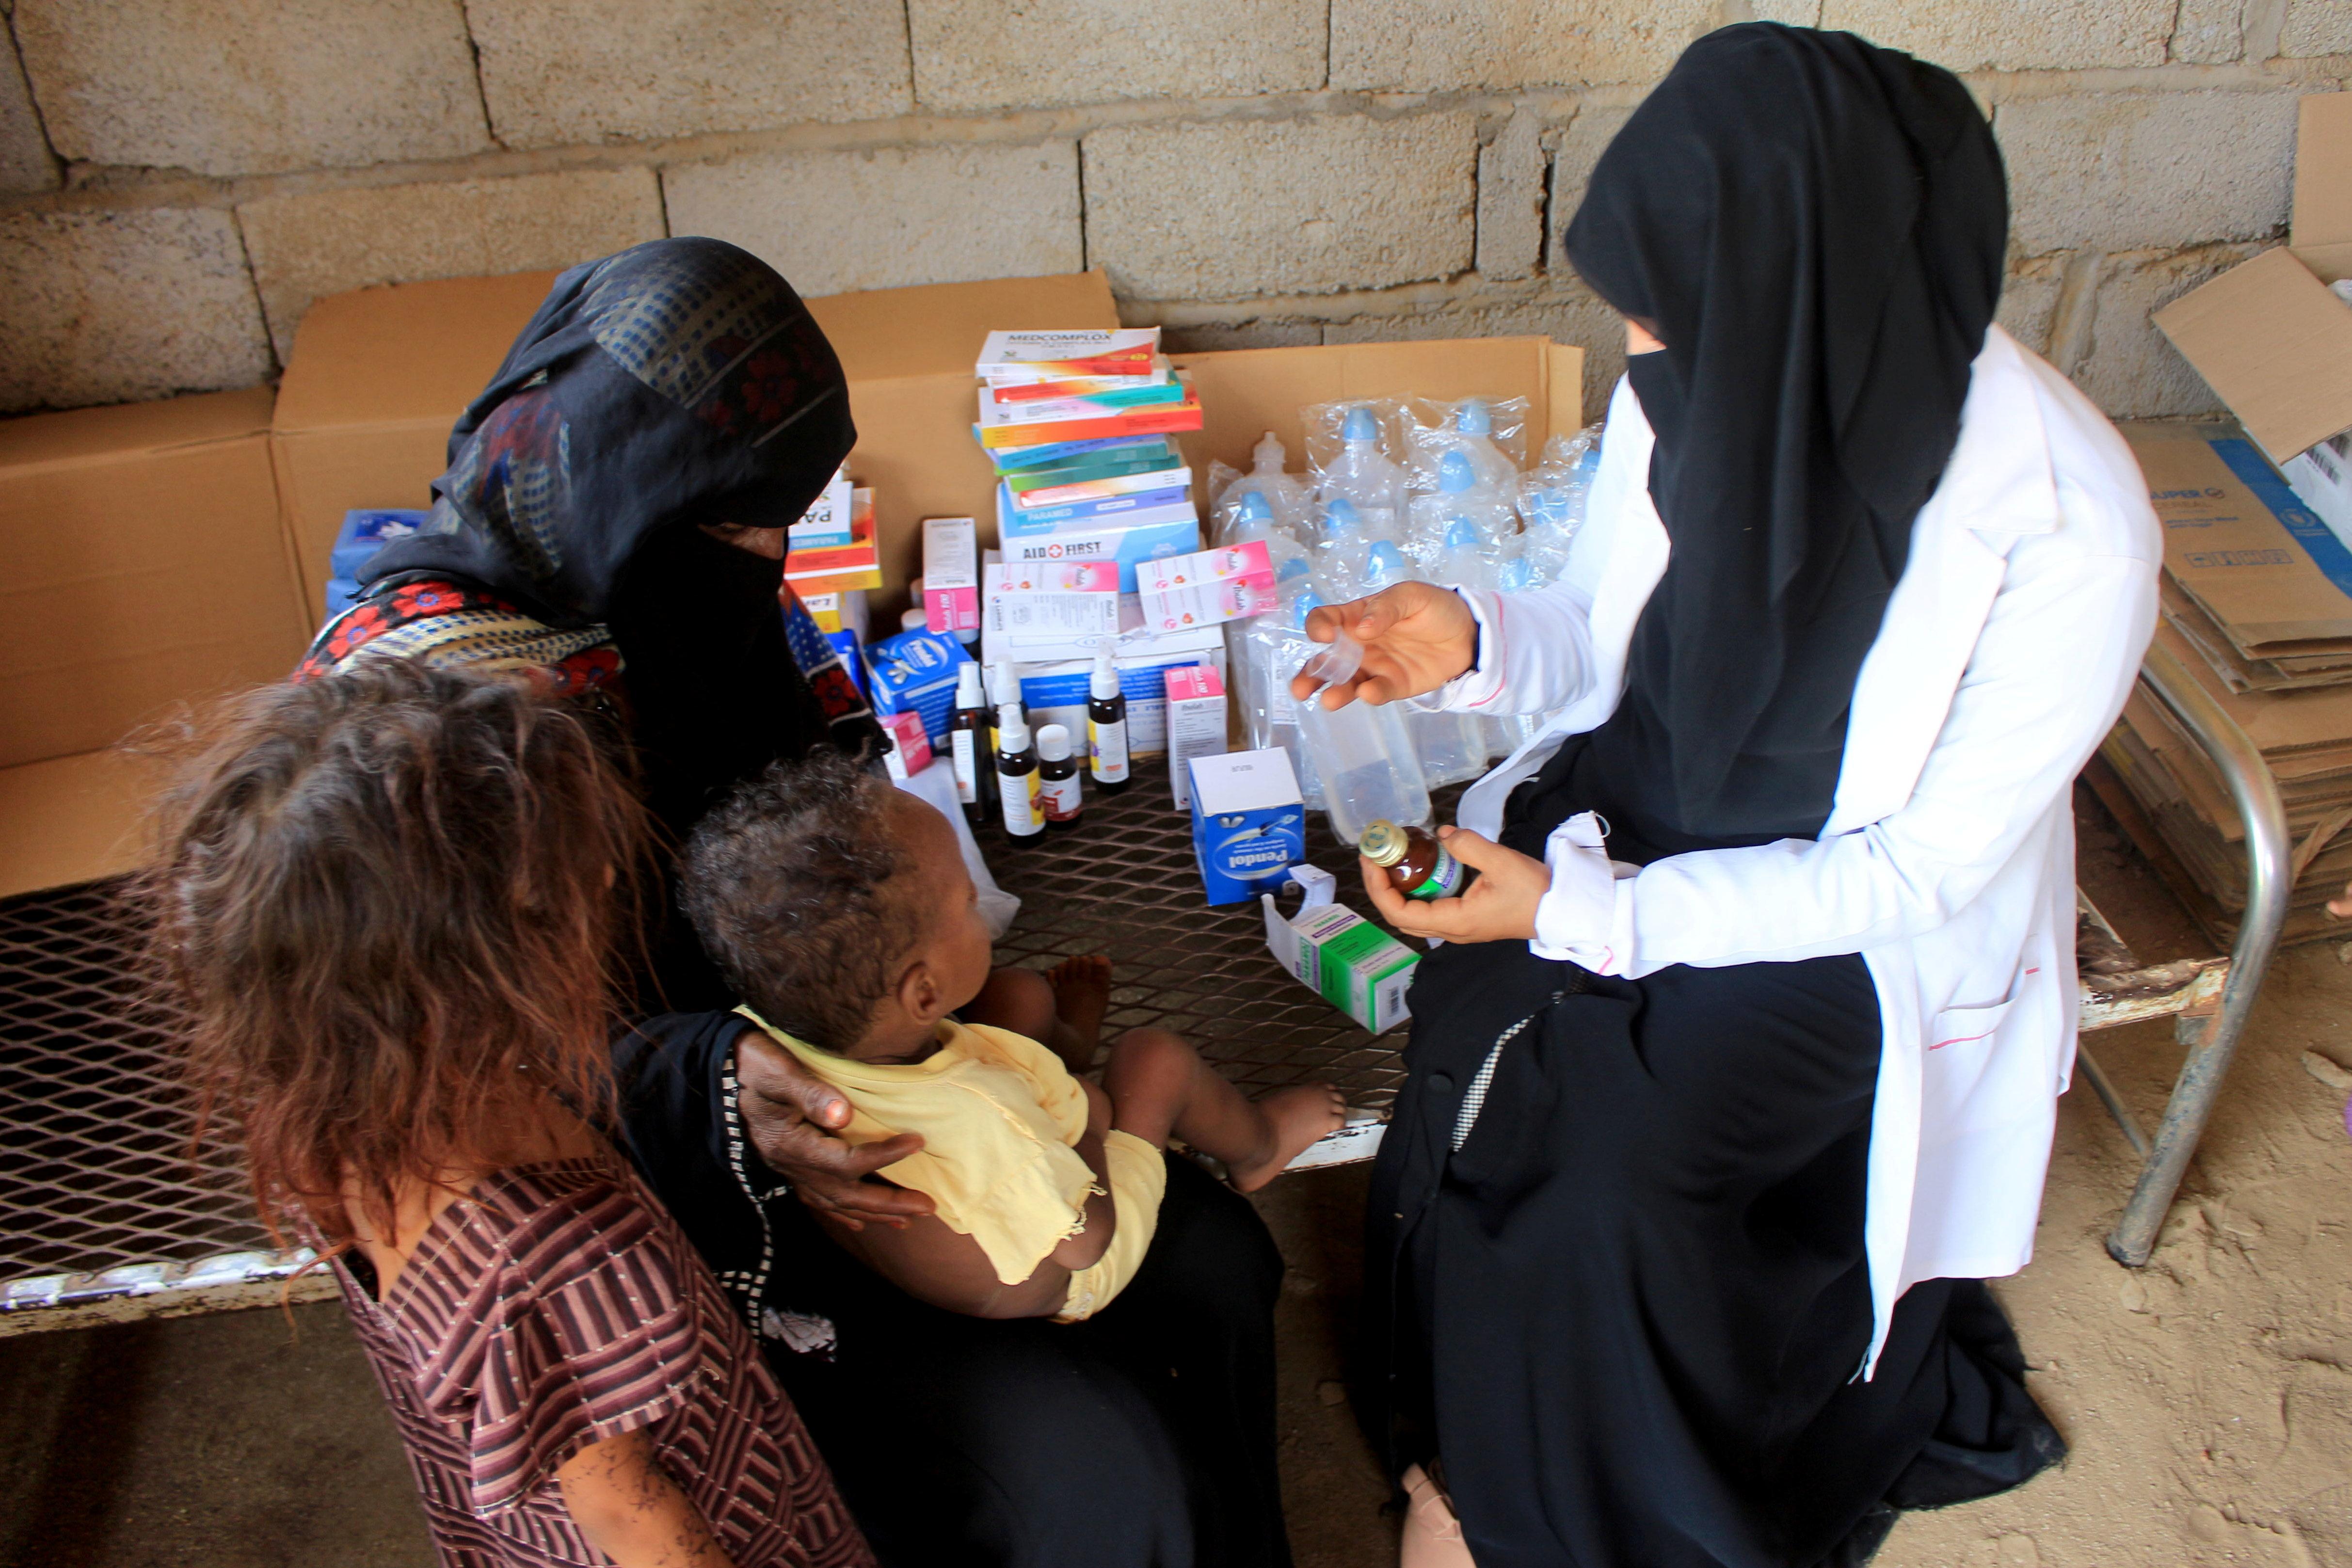 Volunteer health worker Ashwaq Mahmoud checks a medicine as she helps a child in Abs, Yemen September 13, 2021.   REUTERS/Eissa Alragehi